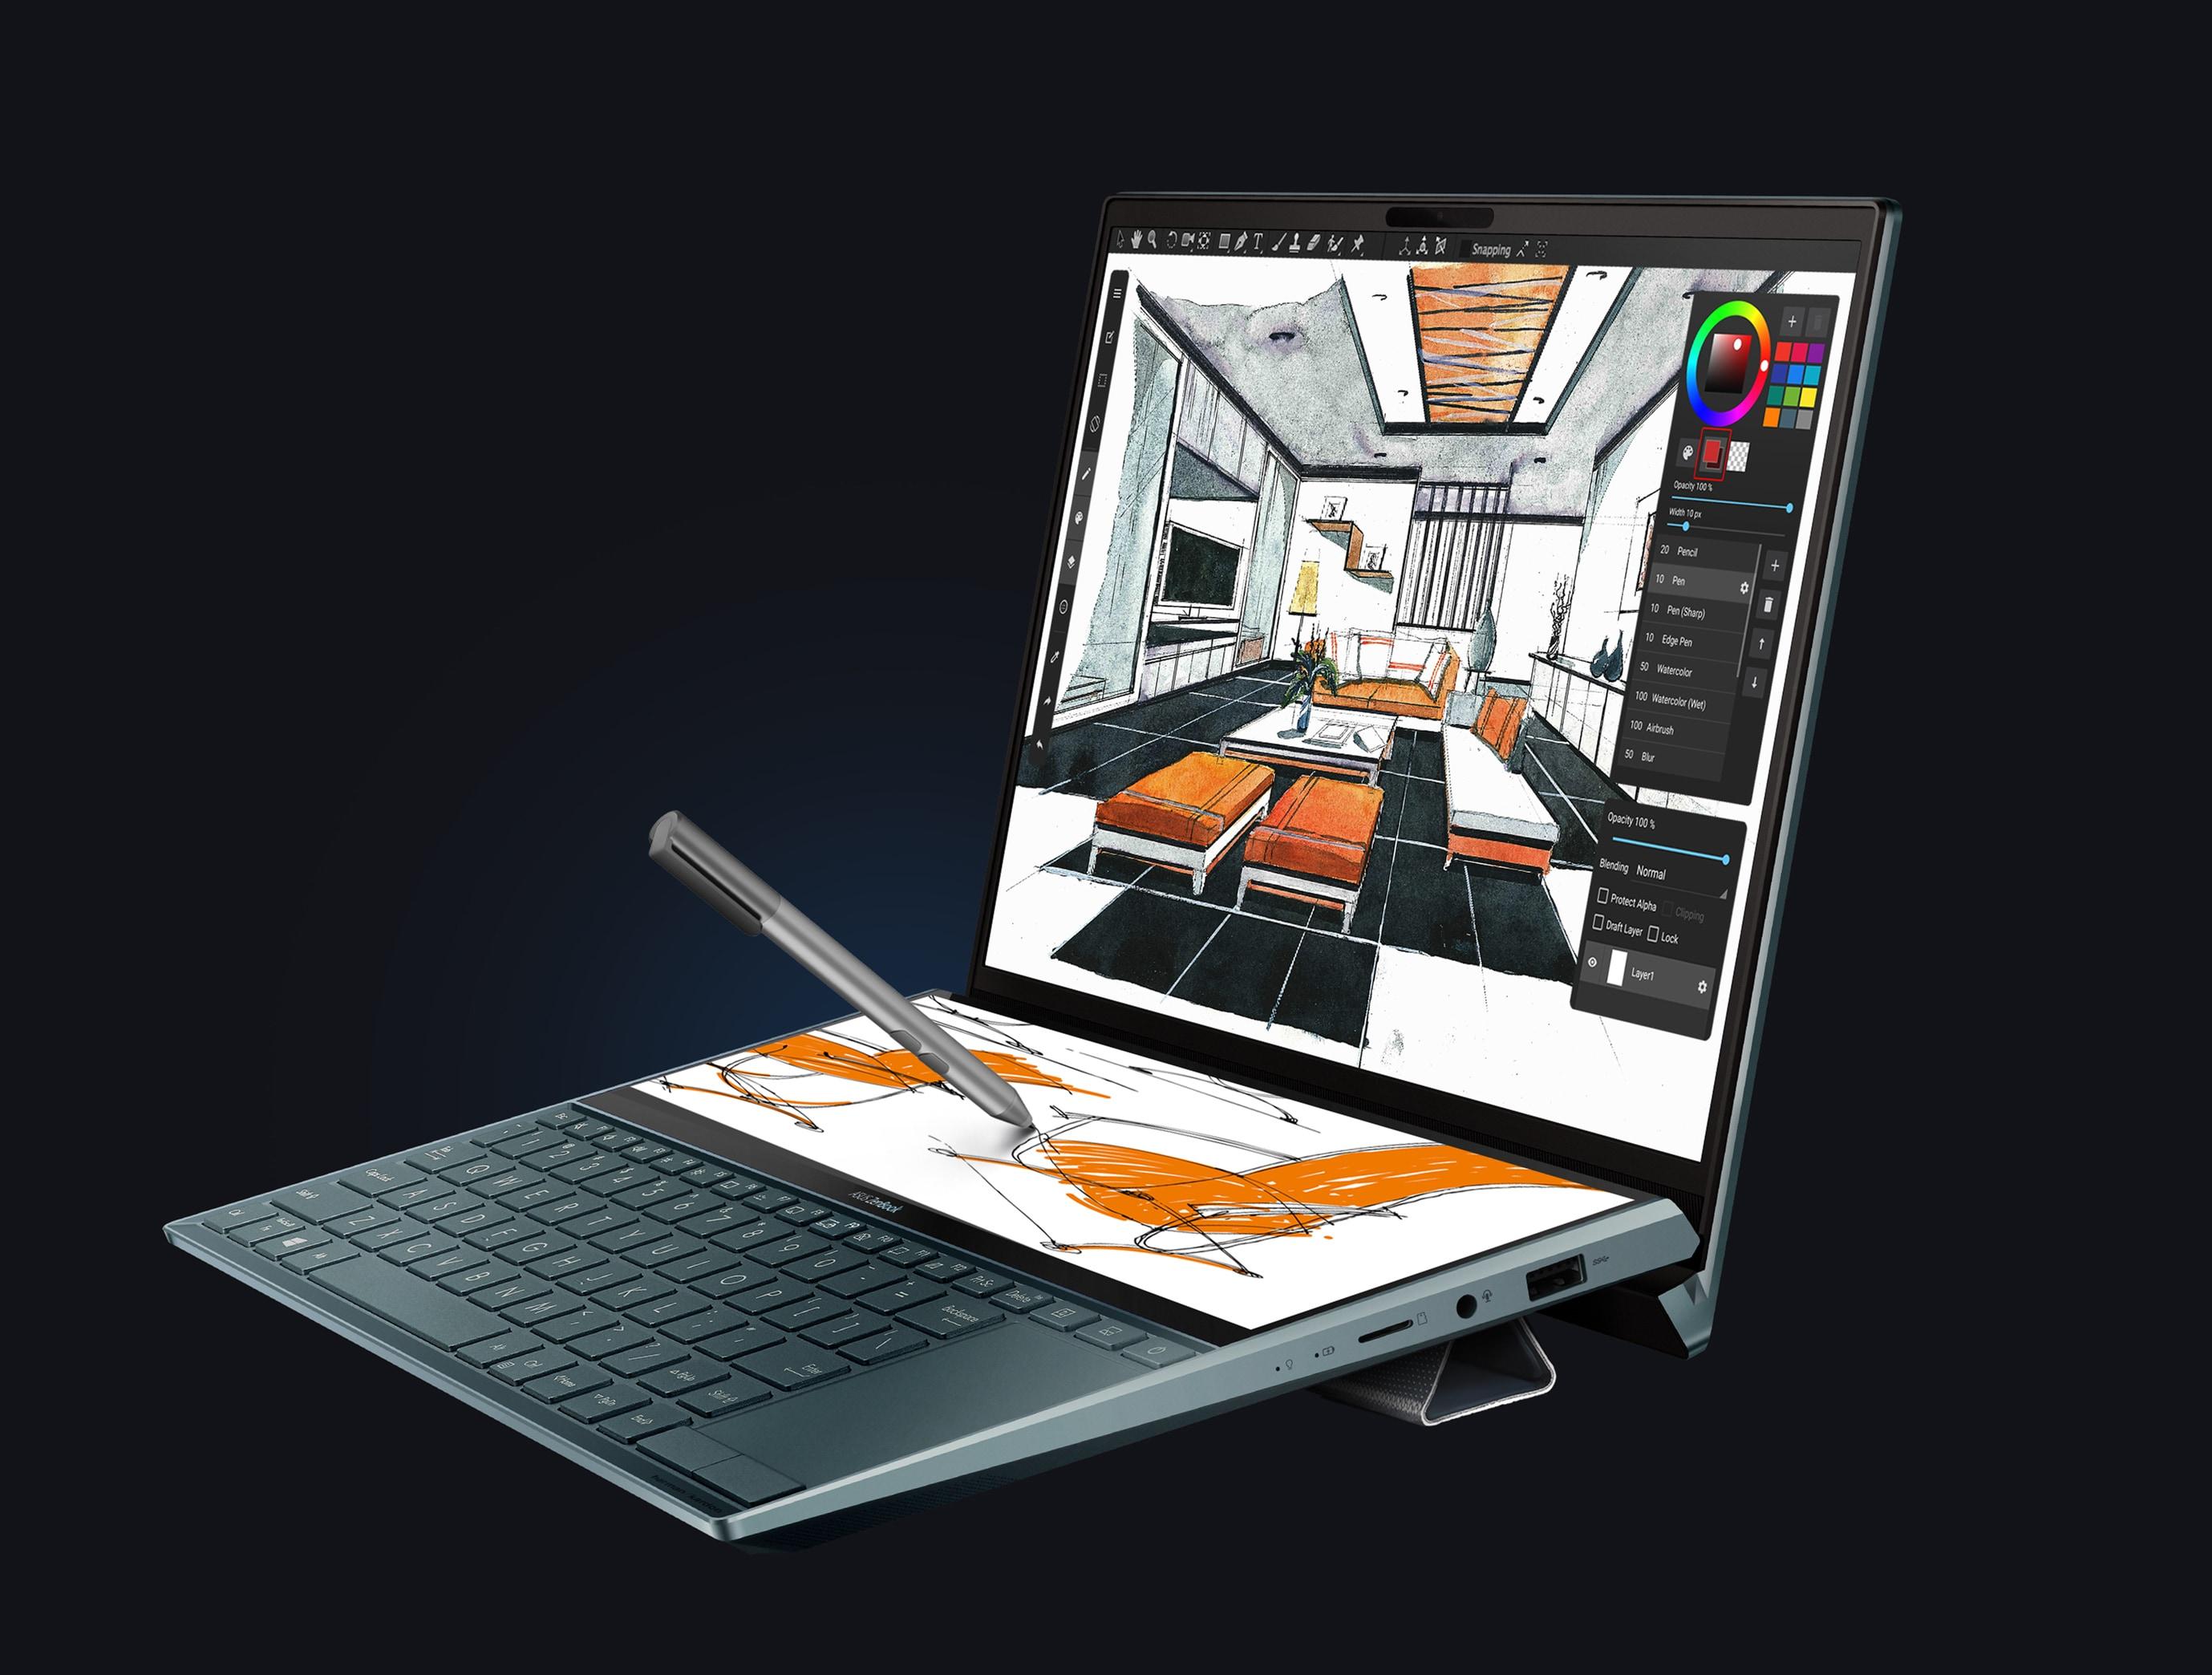 ScreenPad Plus